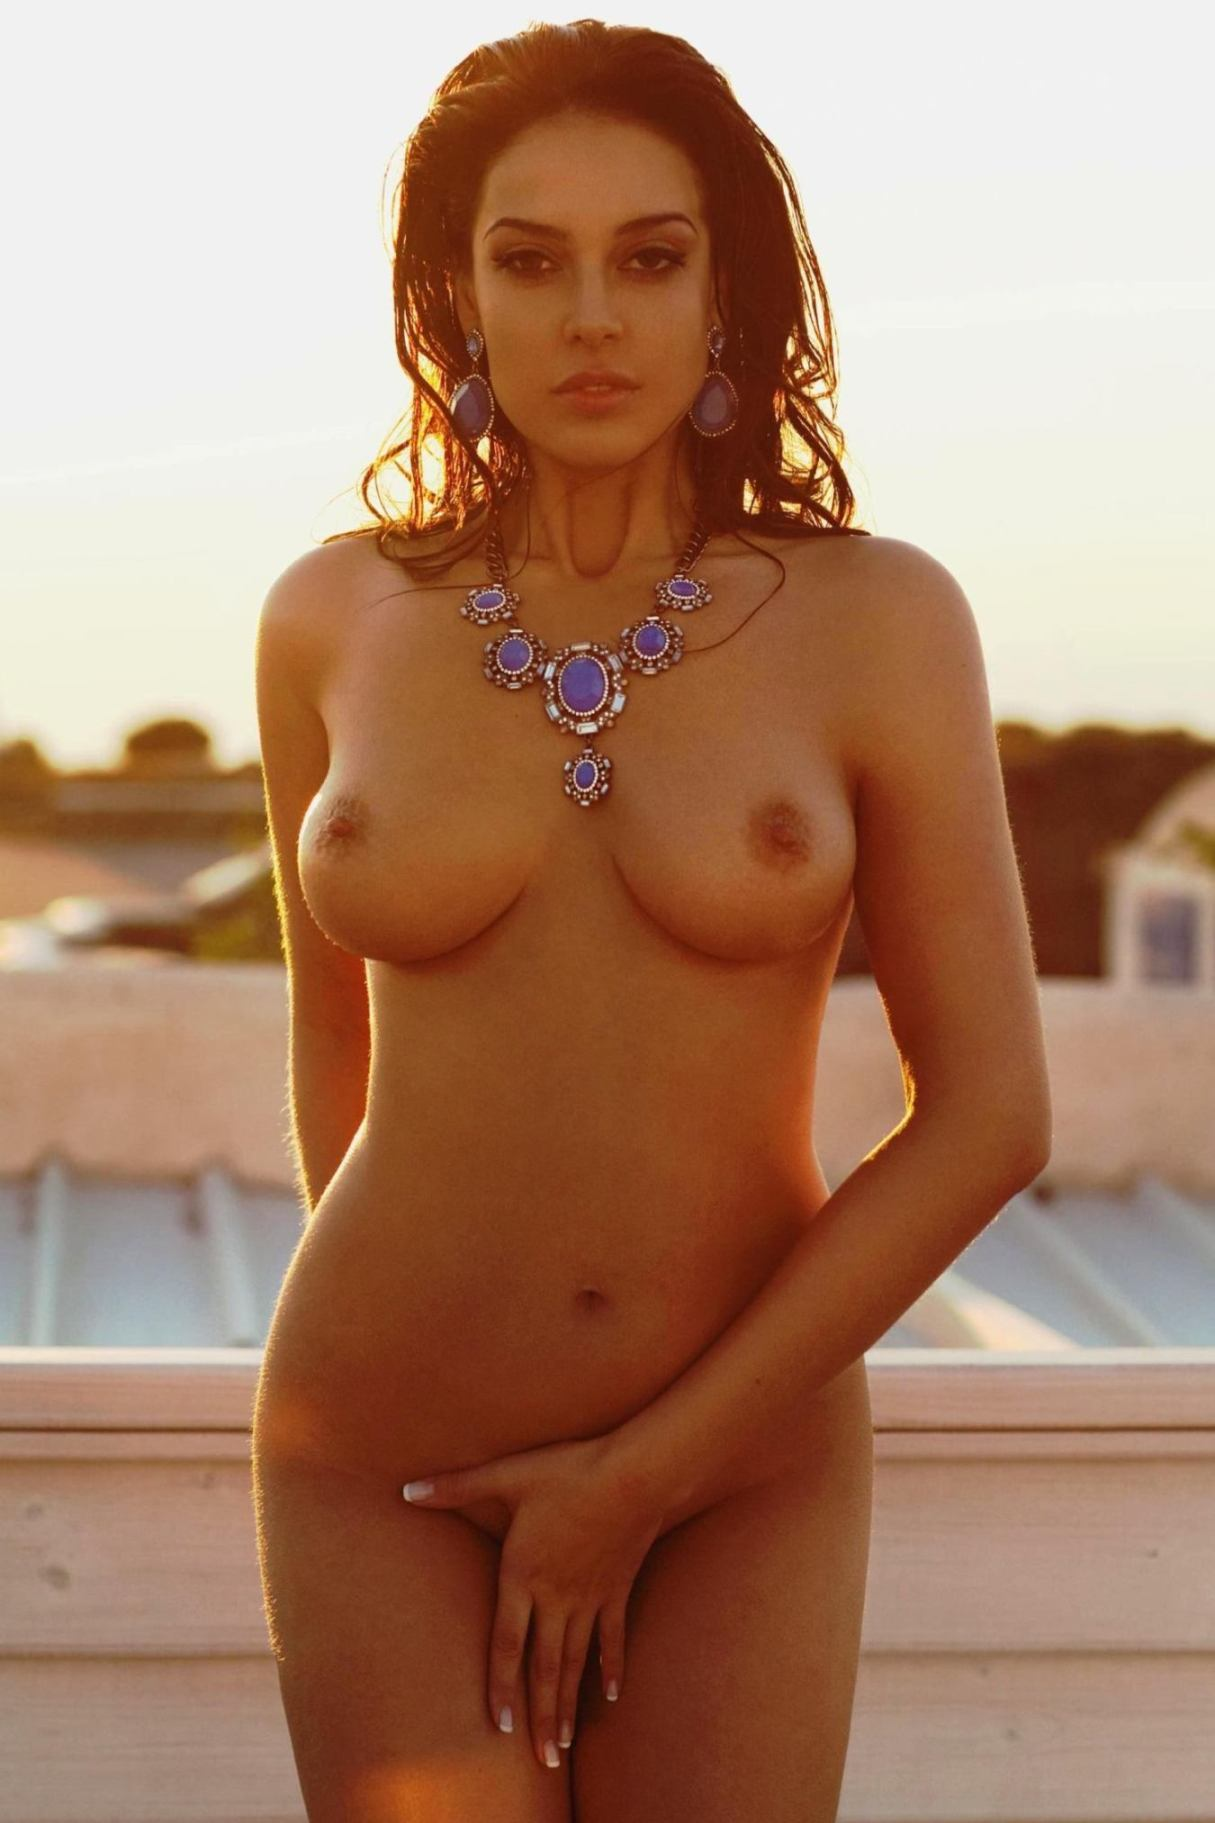 Yelena orlova nude